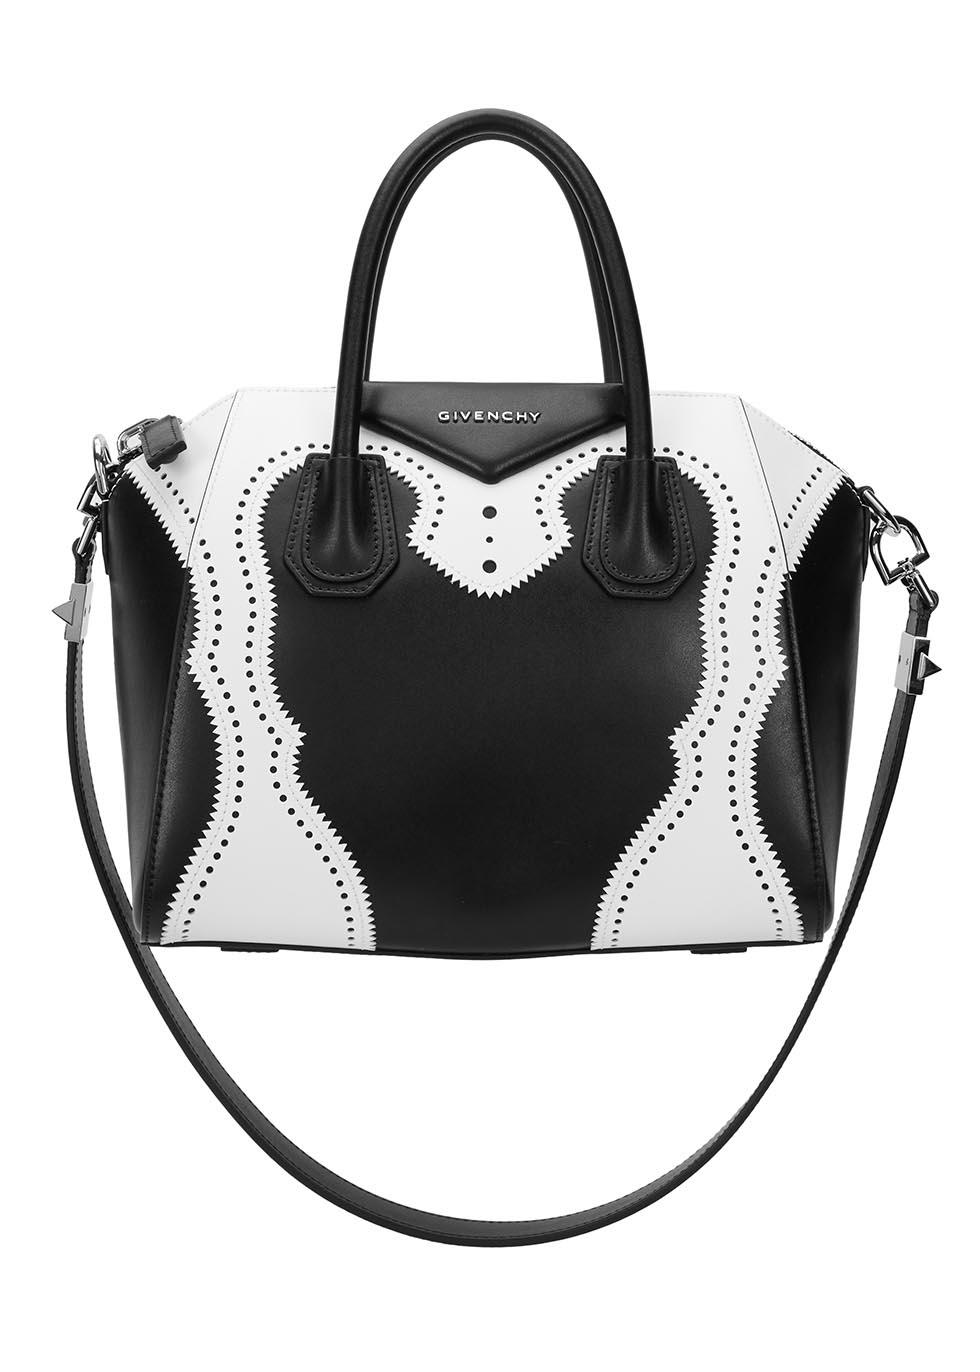 81977329109d Givenchy Black And White Calfskin Mini  antigona  Convertible Tote ...